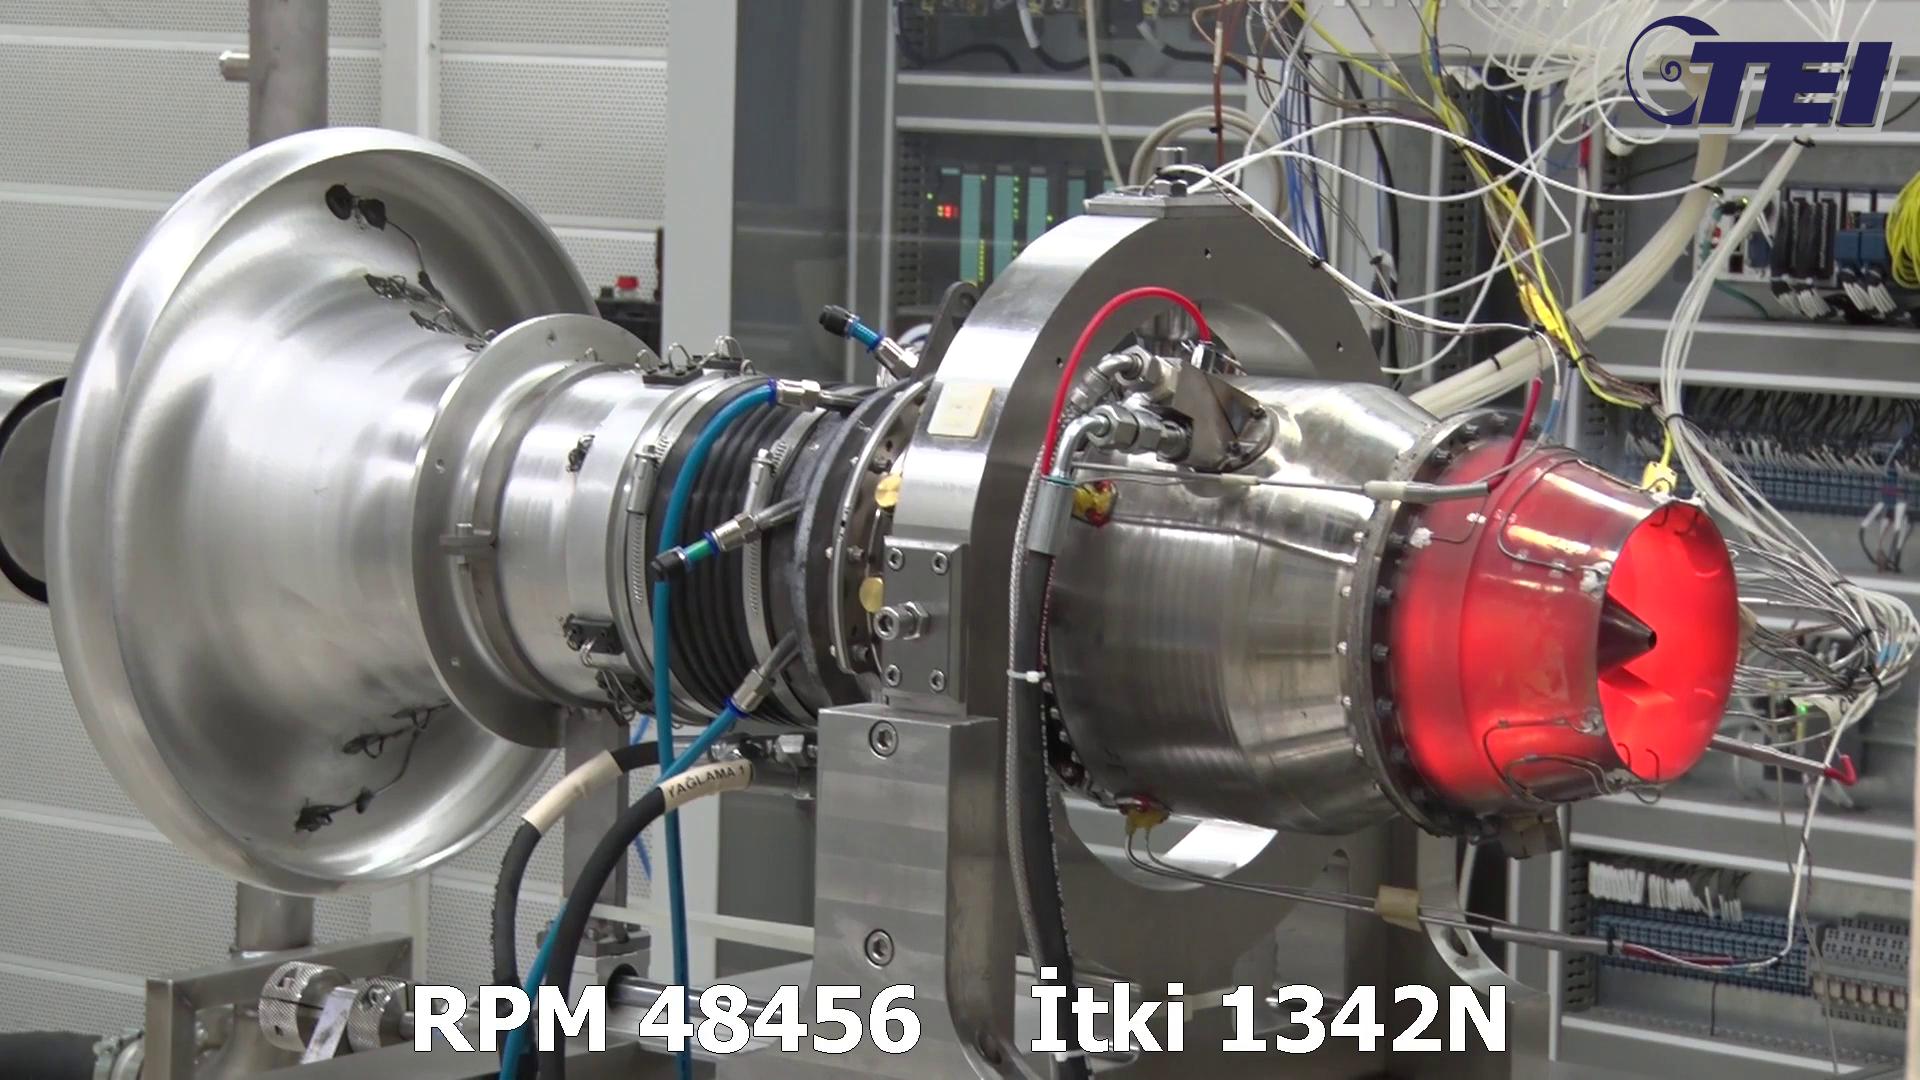 TEI-TJ300 Motorundan Dünya Rekoru